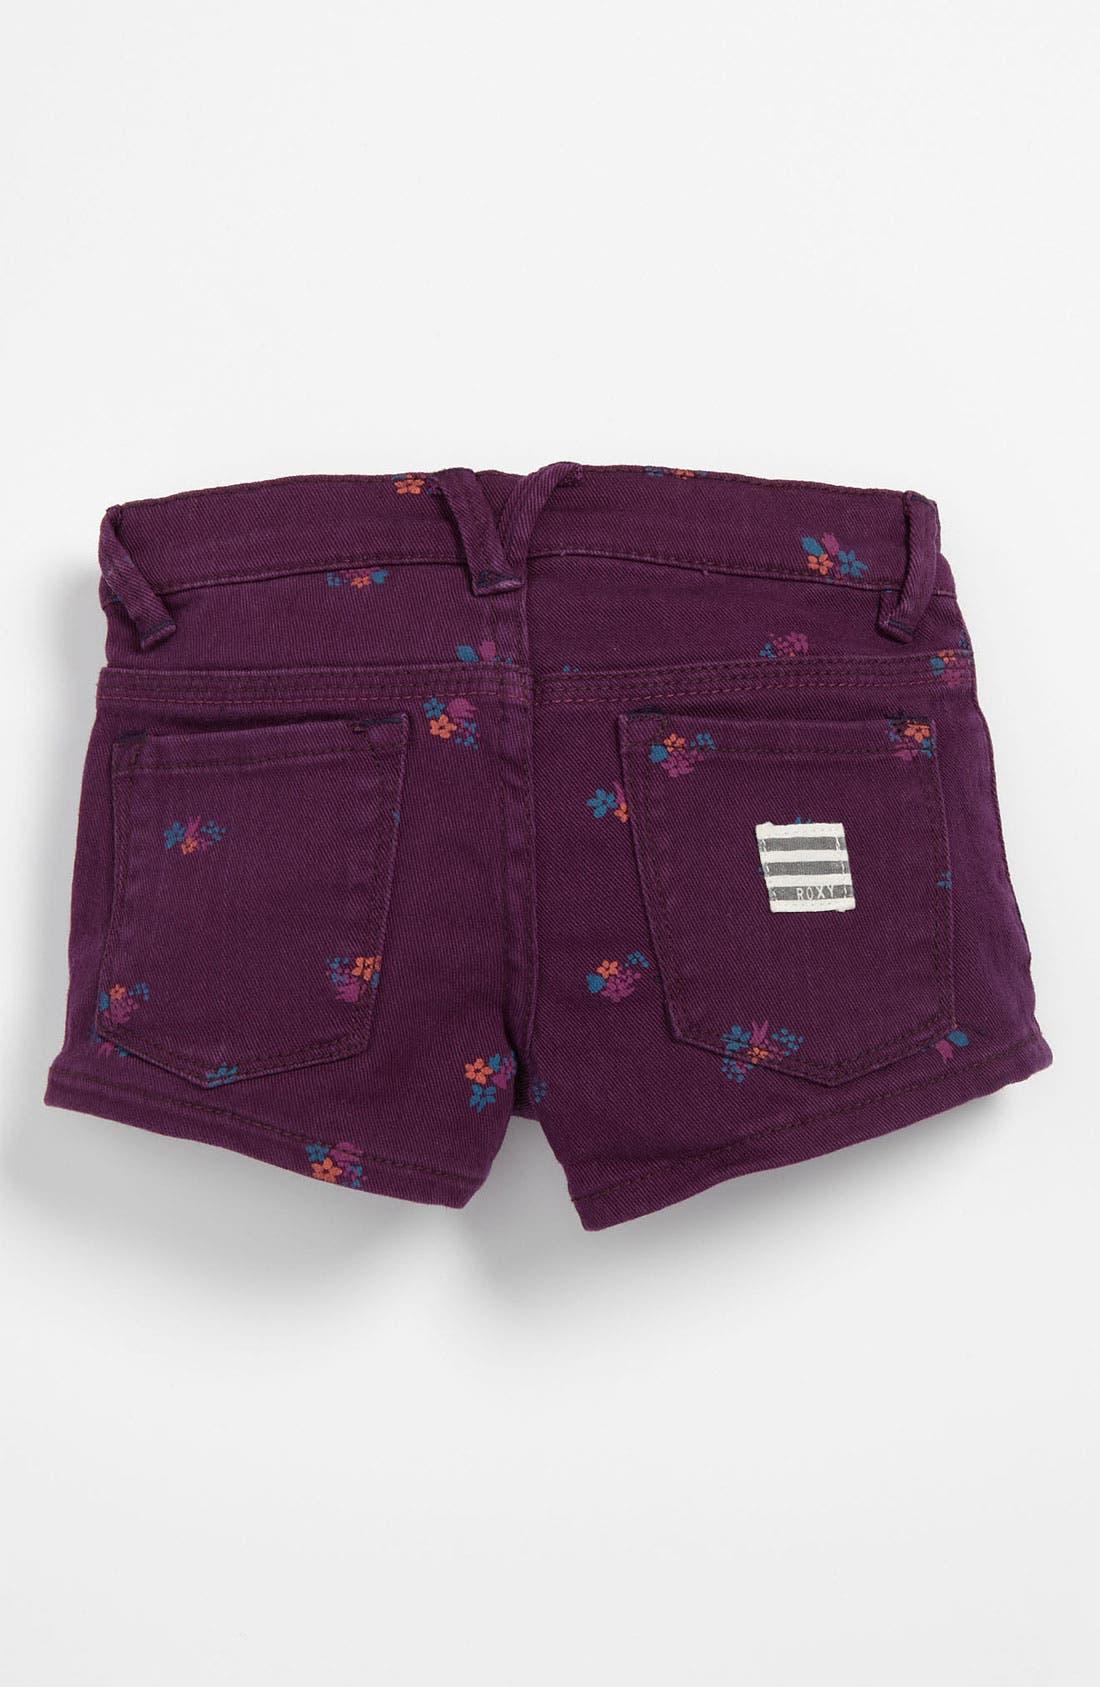 Main Image - Roxy 'Sundown' Colored Shorts (Big Girls)